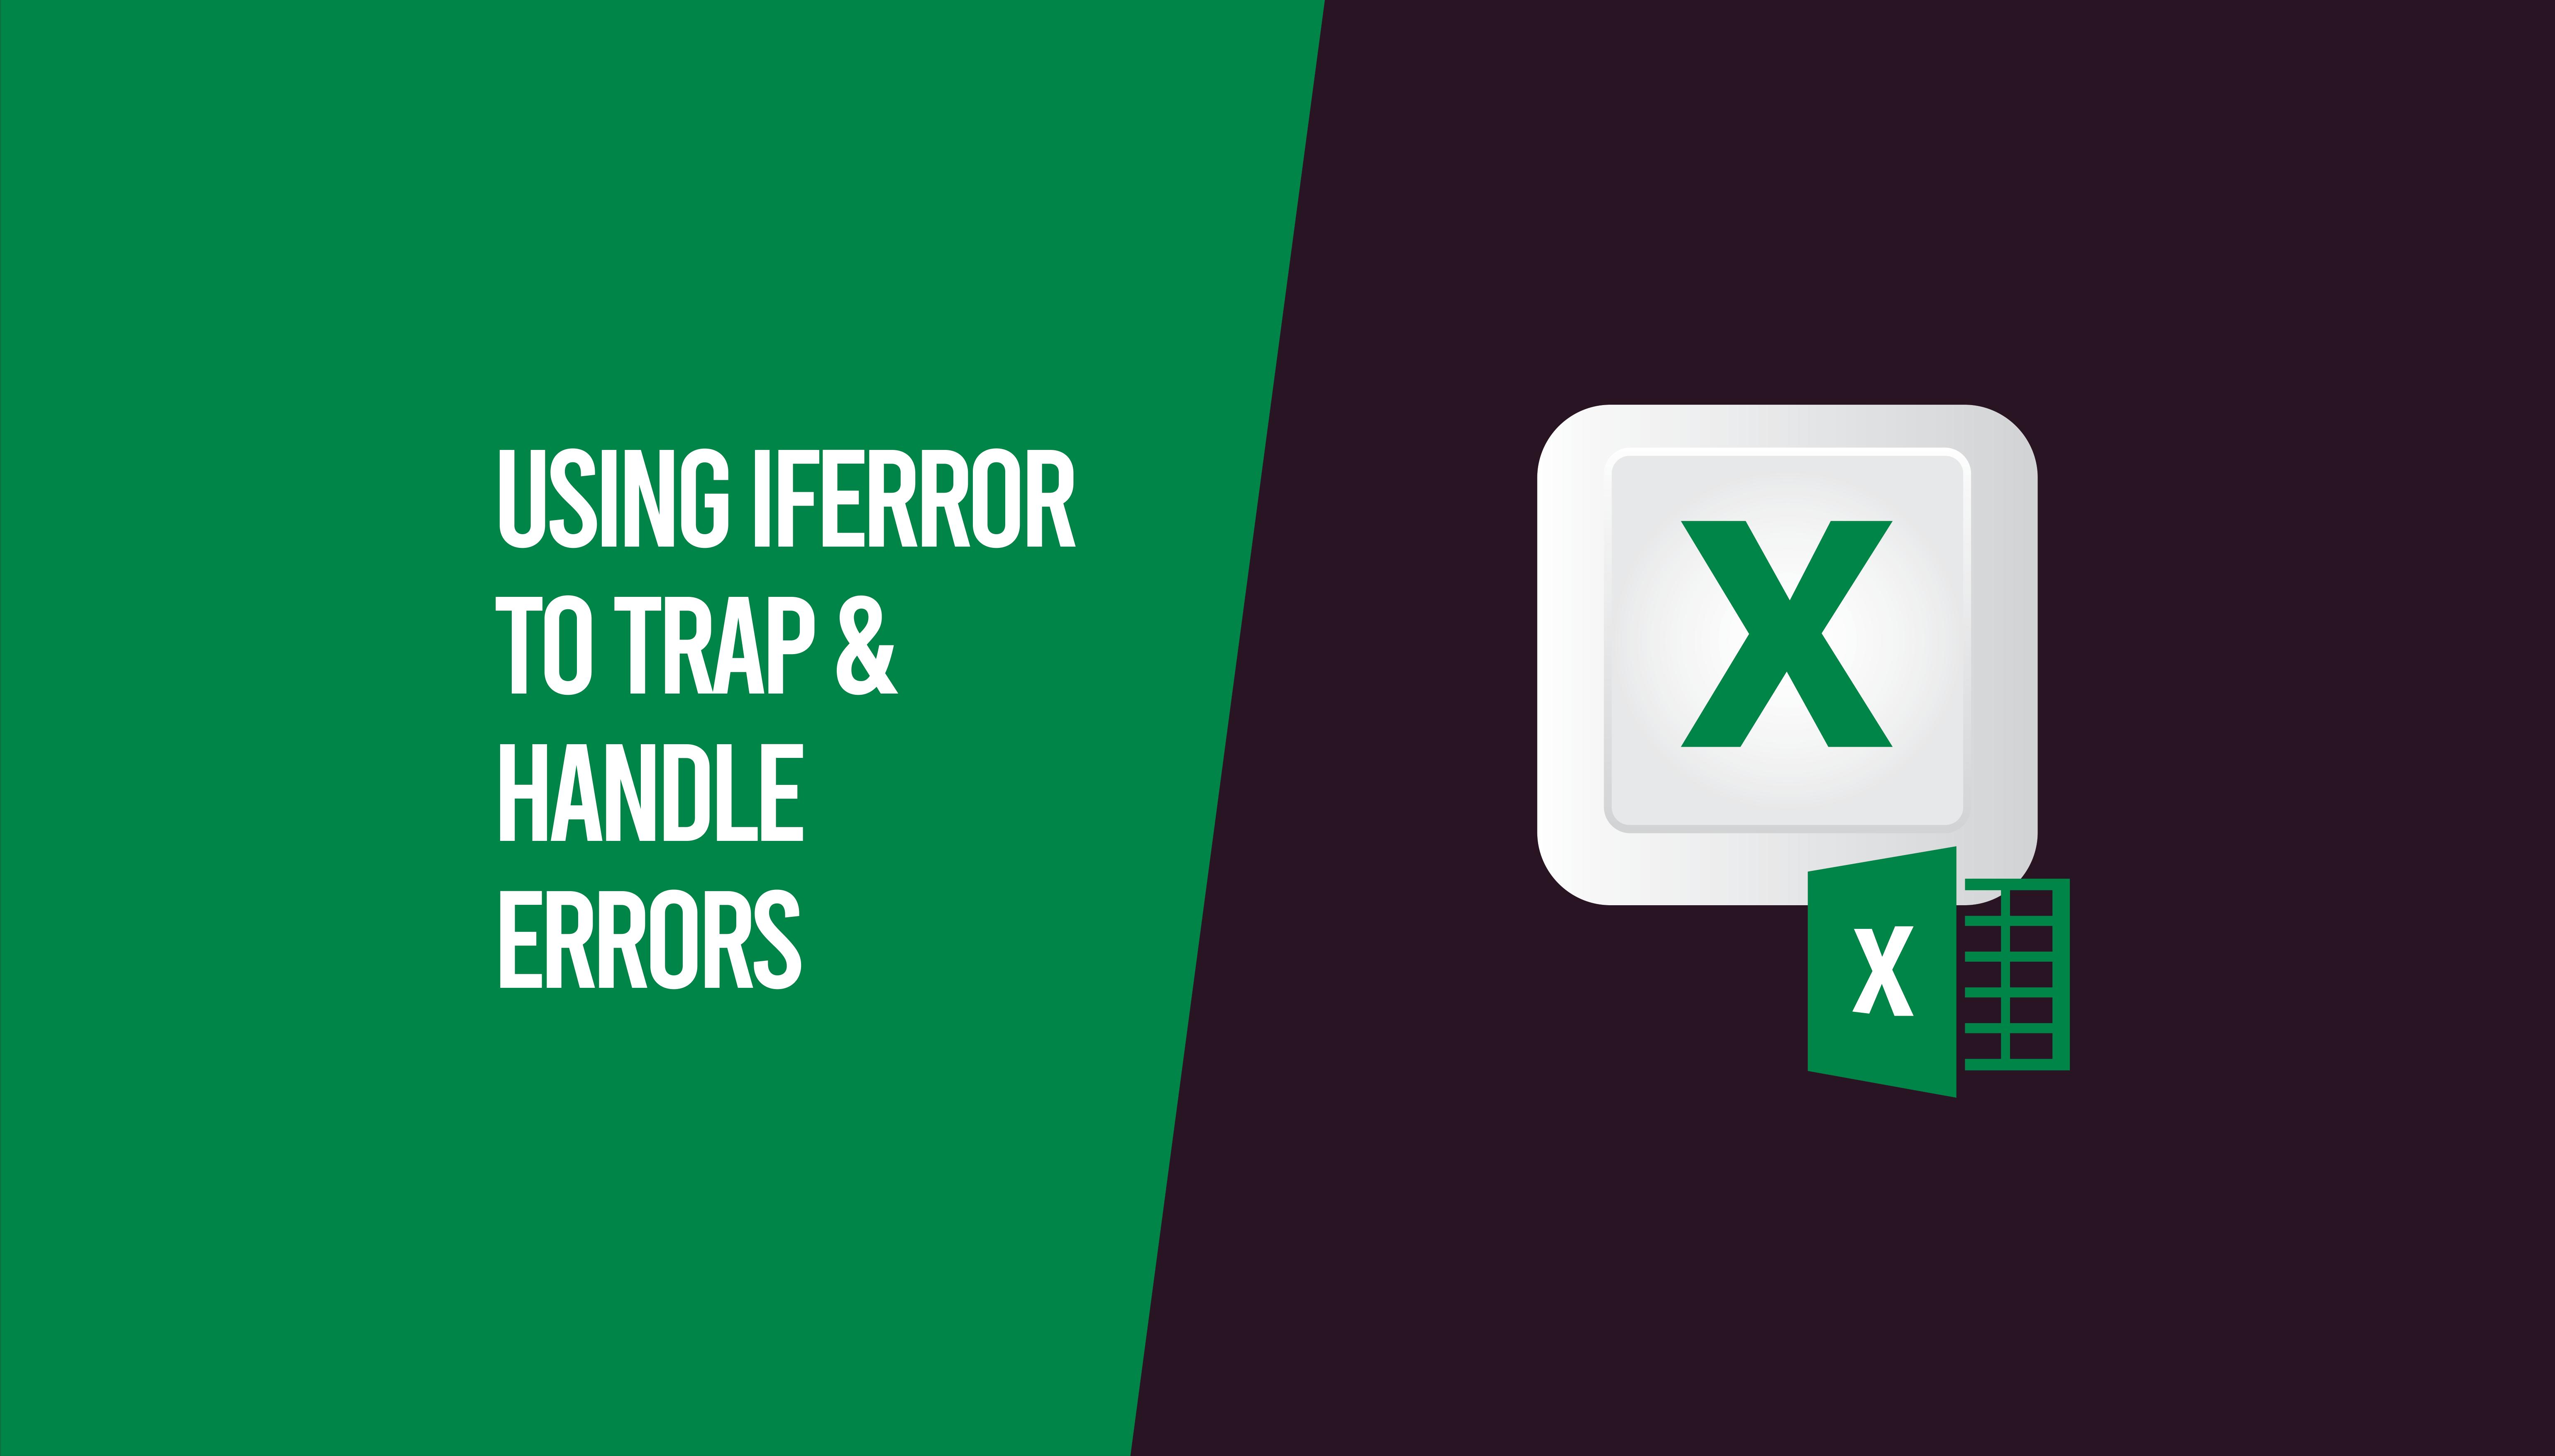 Using iferror in Excel